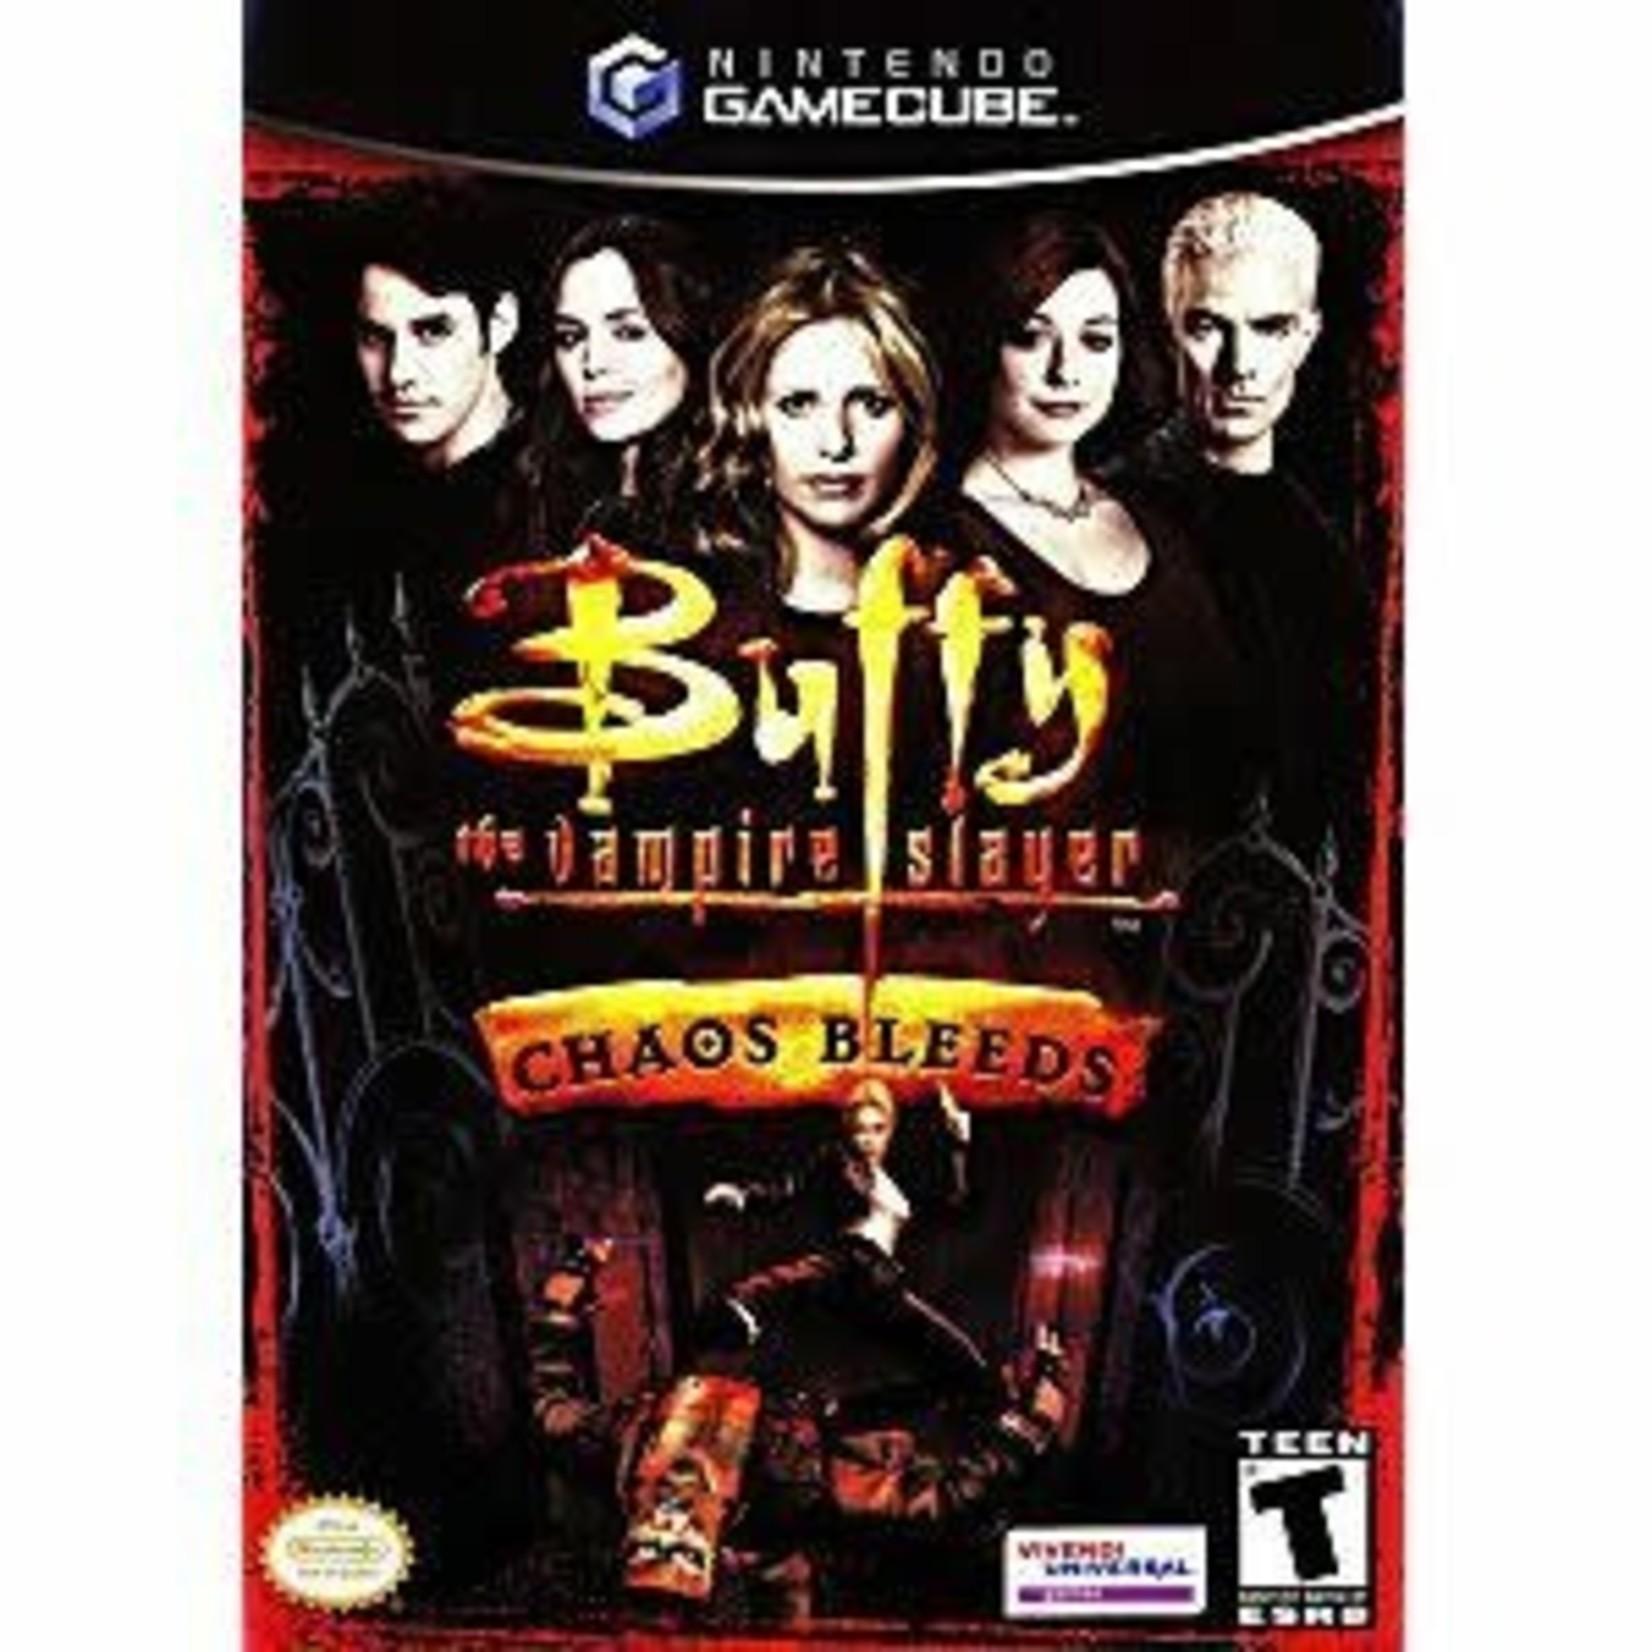 GCU-Buffy The Vampire Slayer Chaos Bleeds